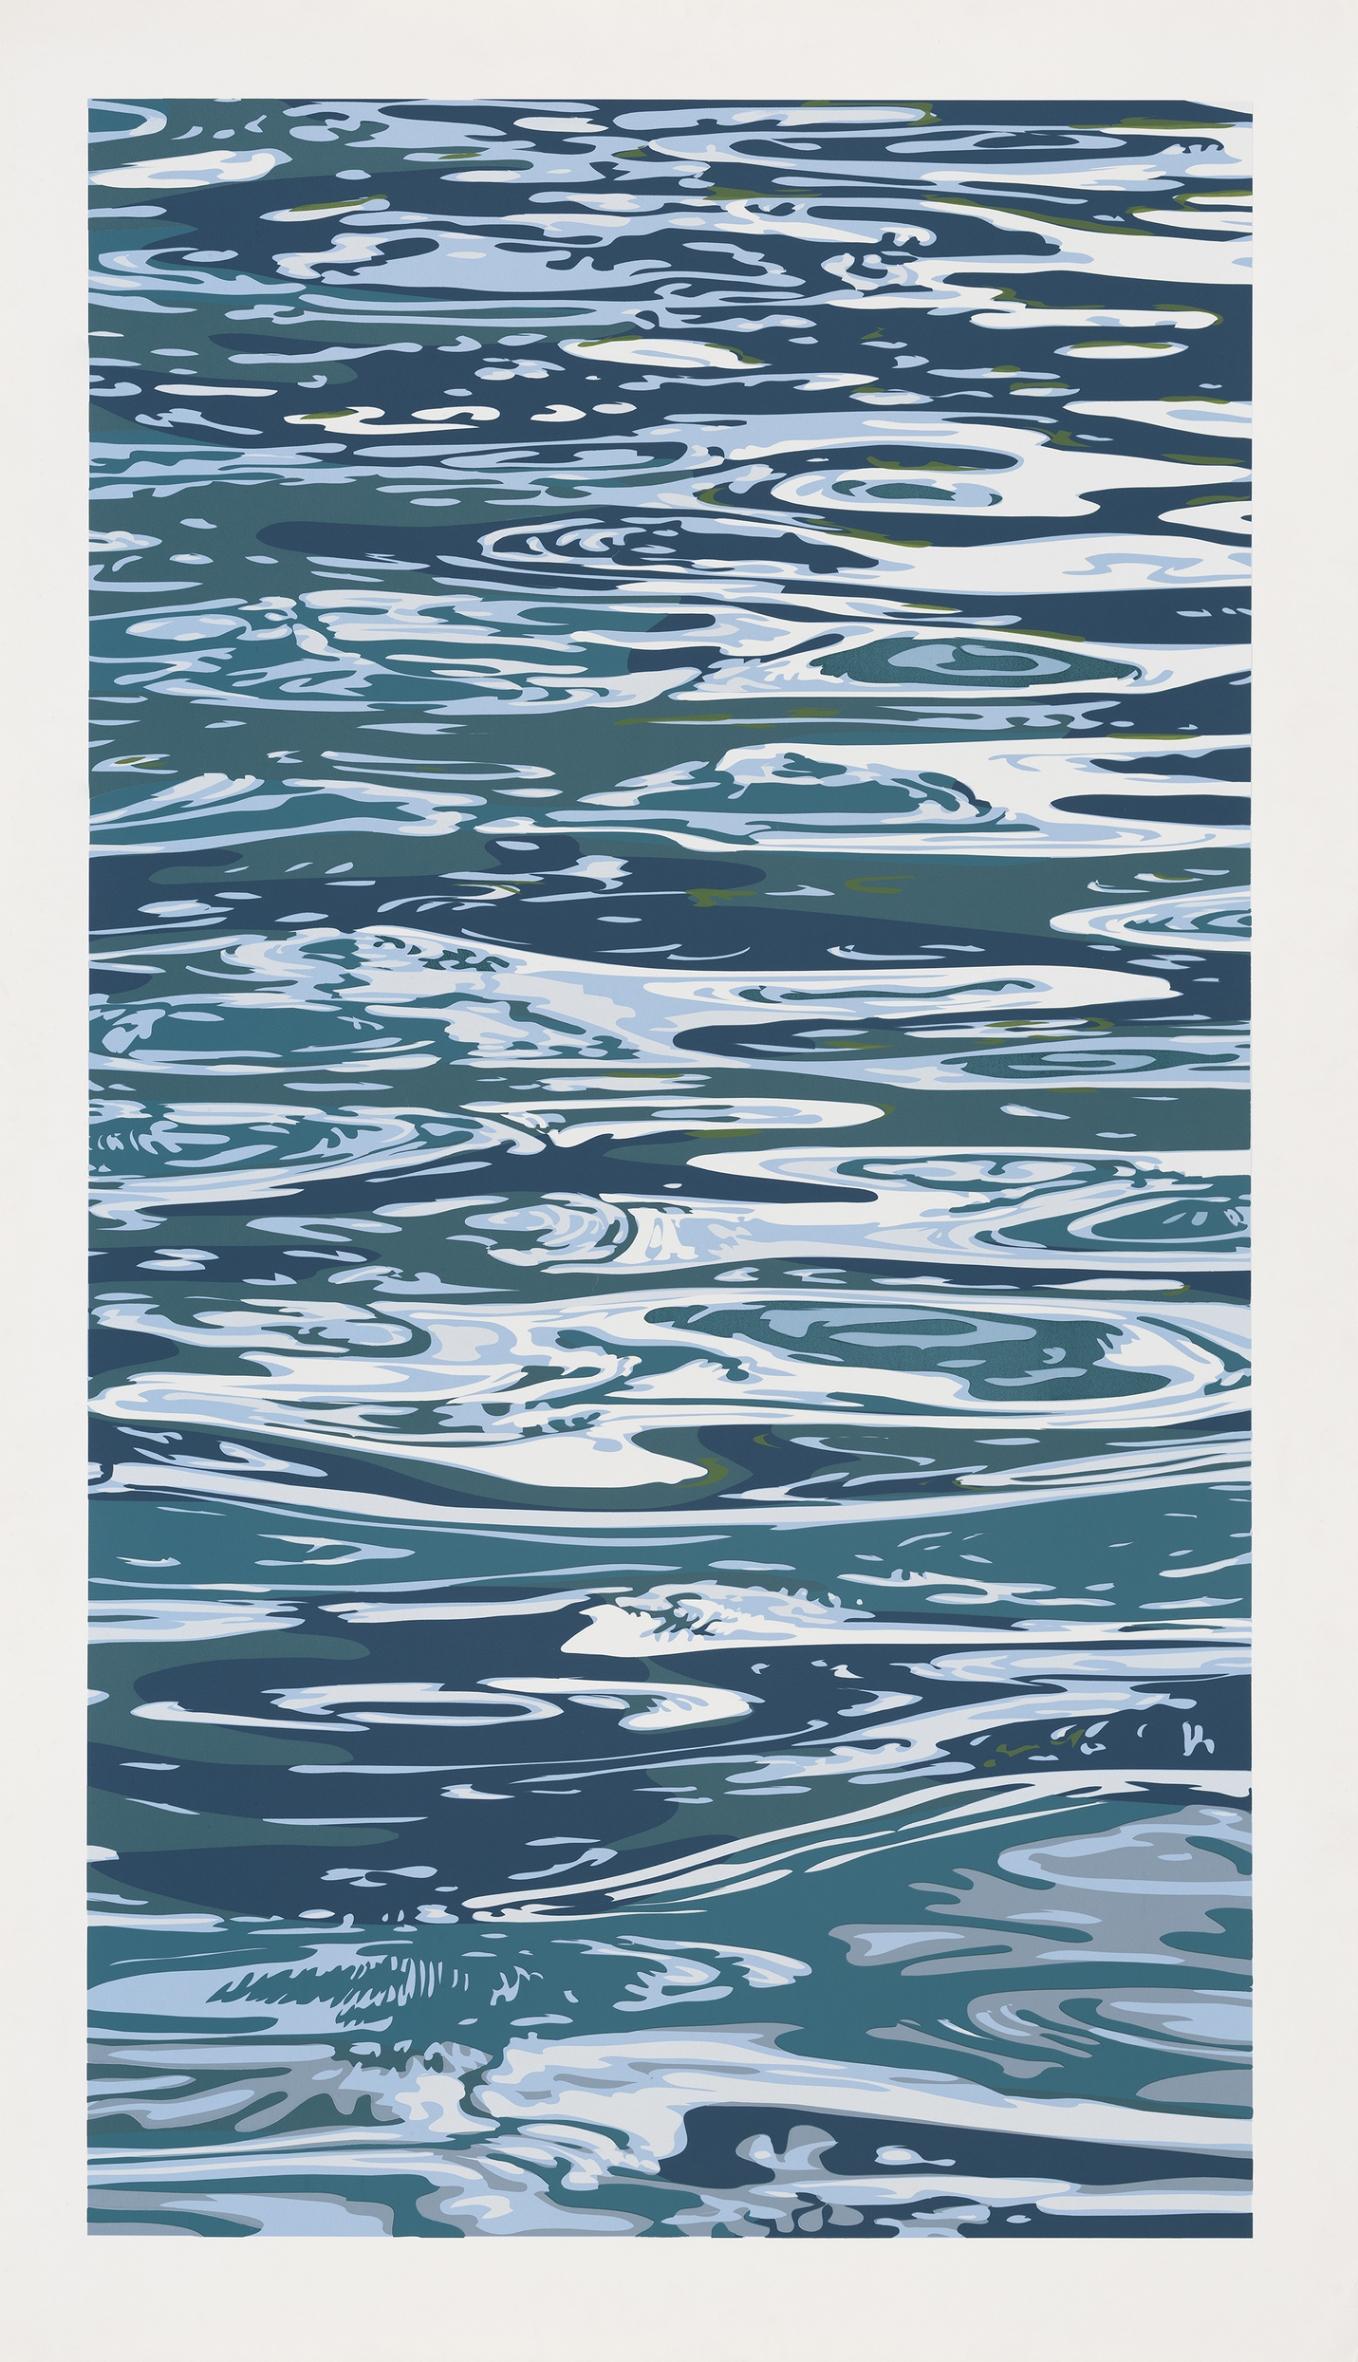 Julian Opie  We Lounged by the Pool •2003  Serigrafia Edição: 25 200 x 116 cm